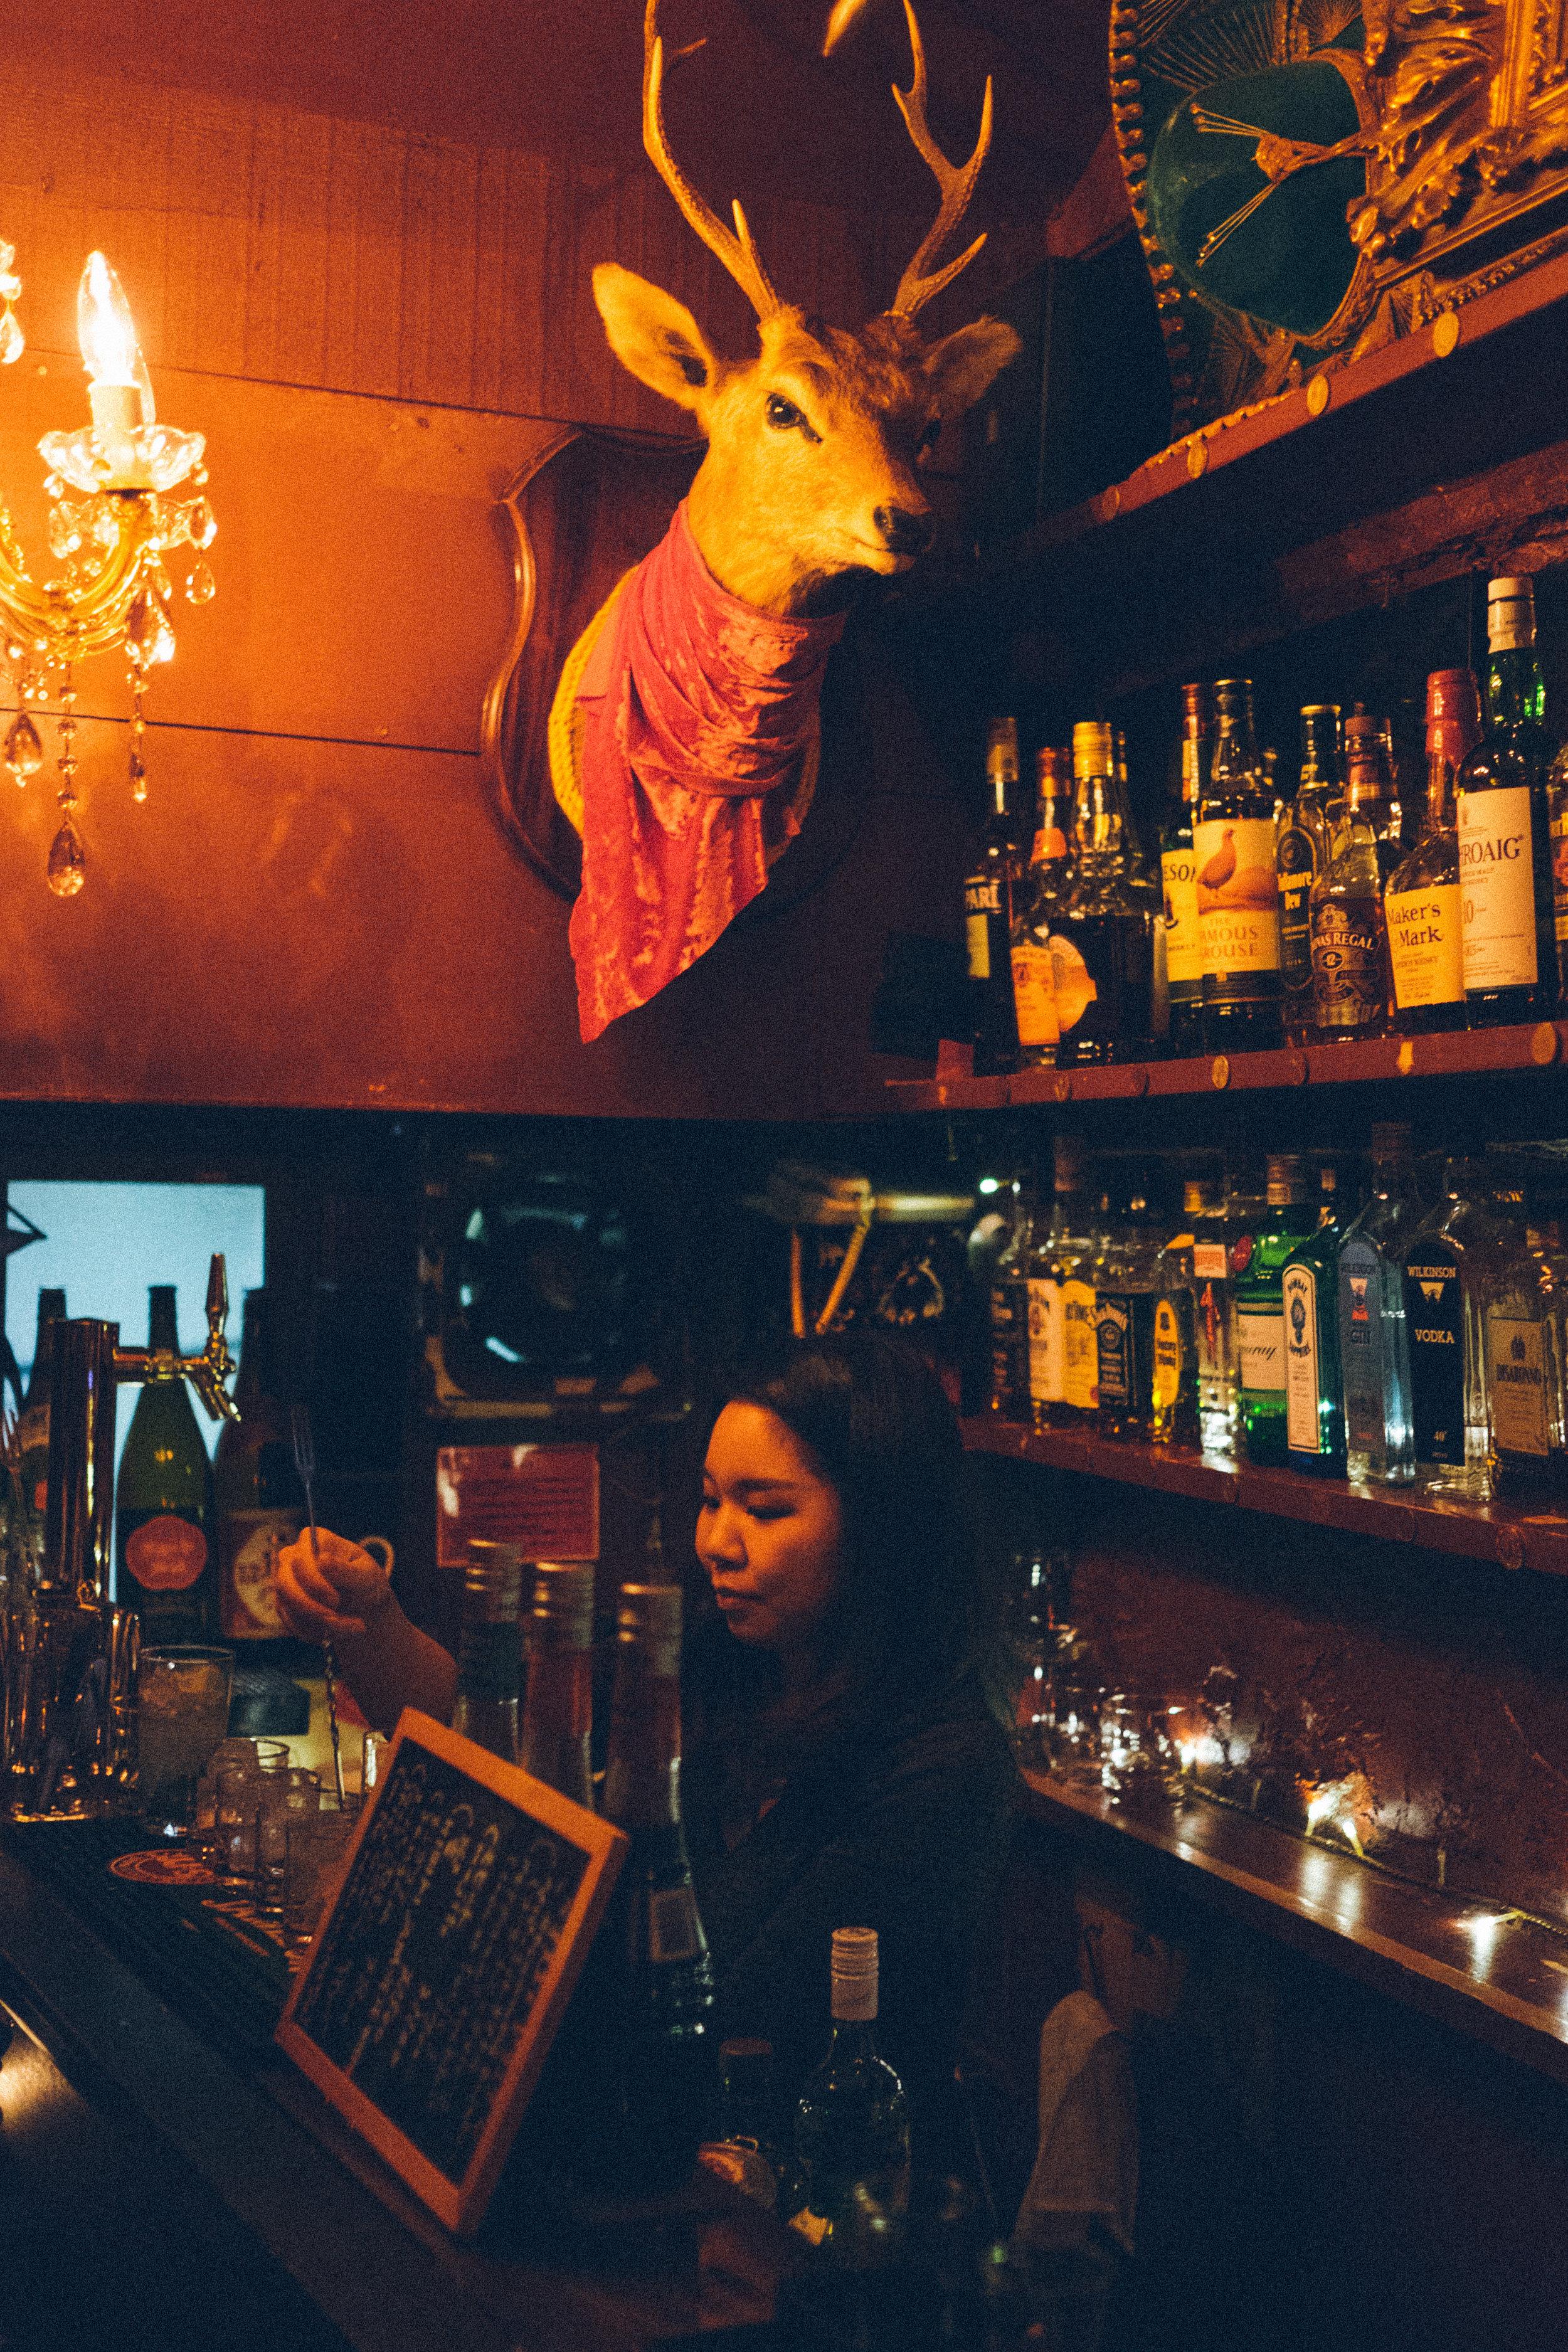 Bar in Golden Gai